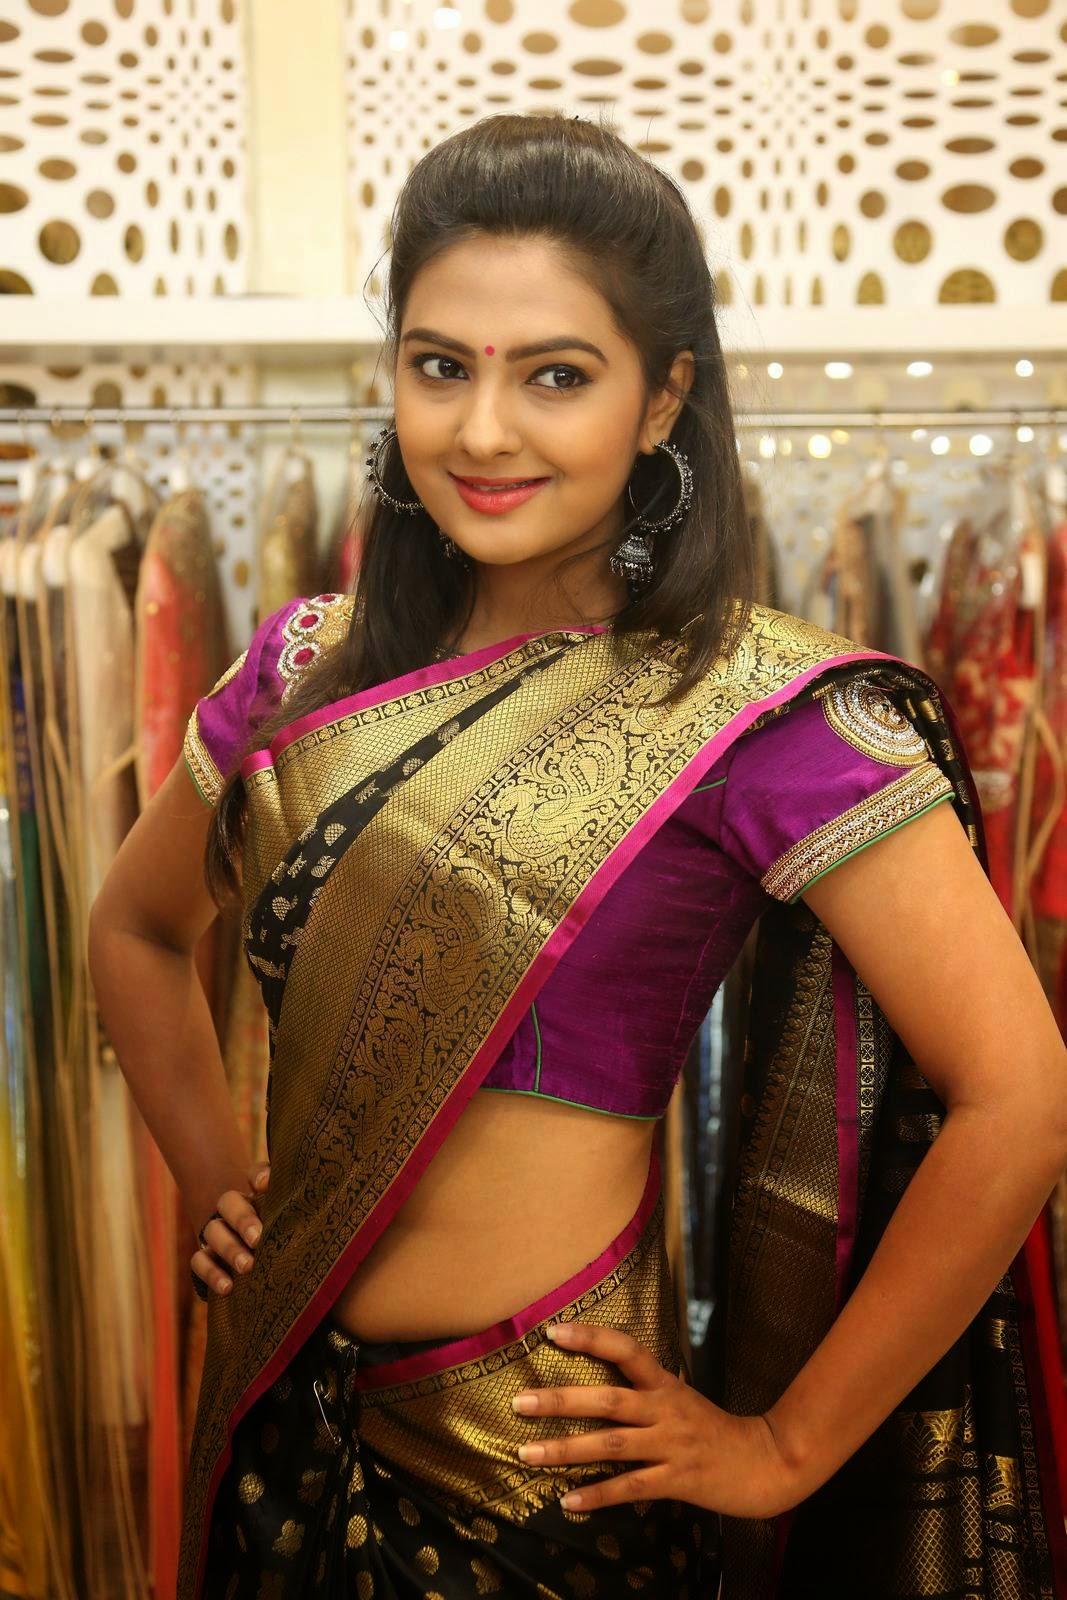 Actress Neha Deshpande Spicy Saree Stills - Cap-4023